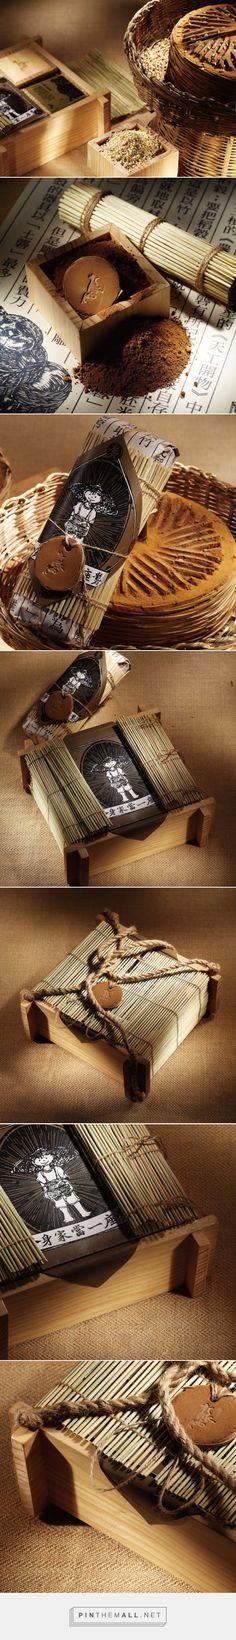 LON 礱  designed by Chen Jun Wei on Packaging of the World - Creative Package Design Gallery  - http://www.packagingoftheworld.com/2015/04/lon.html